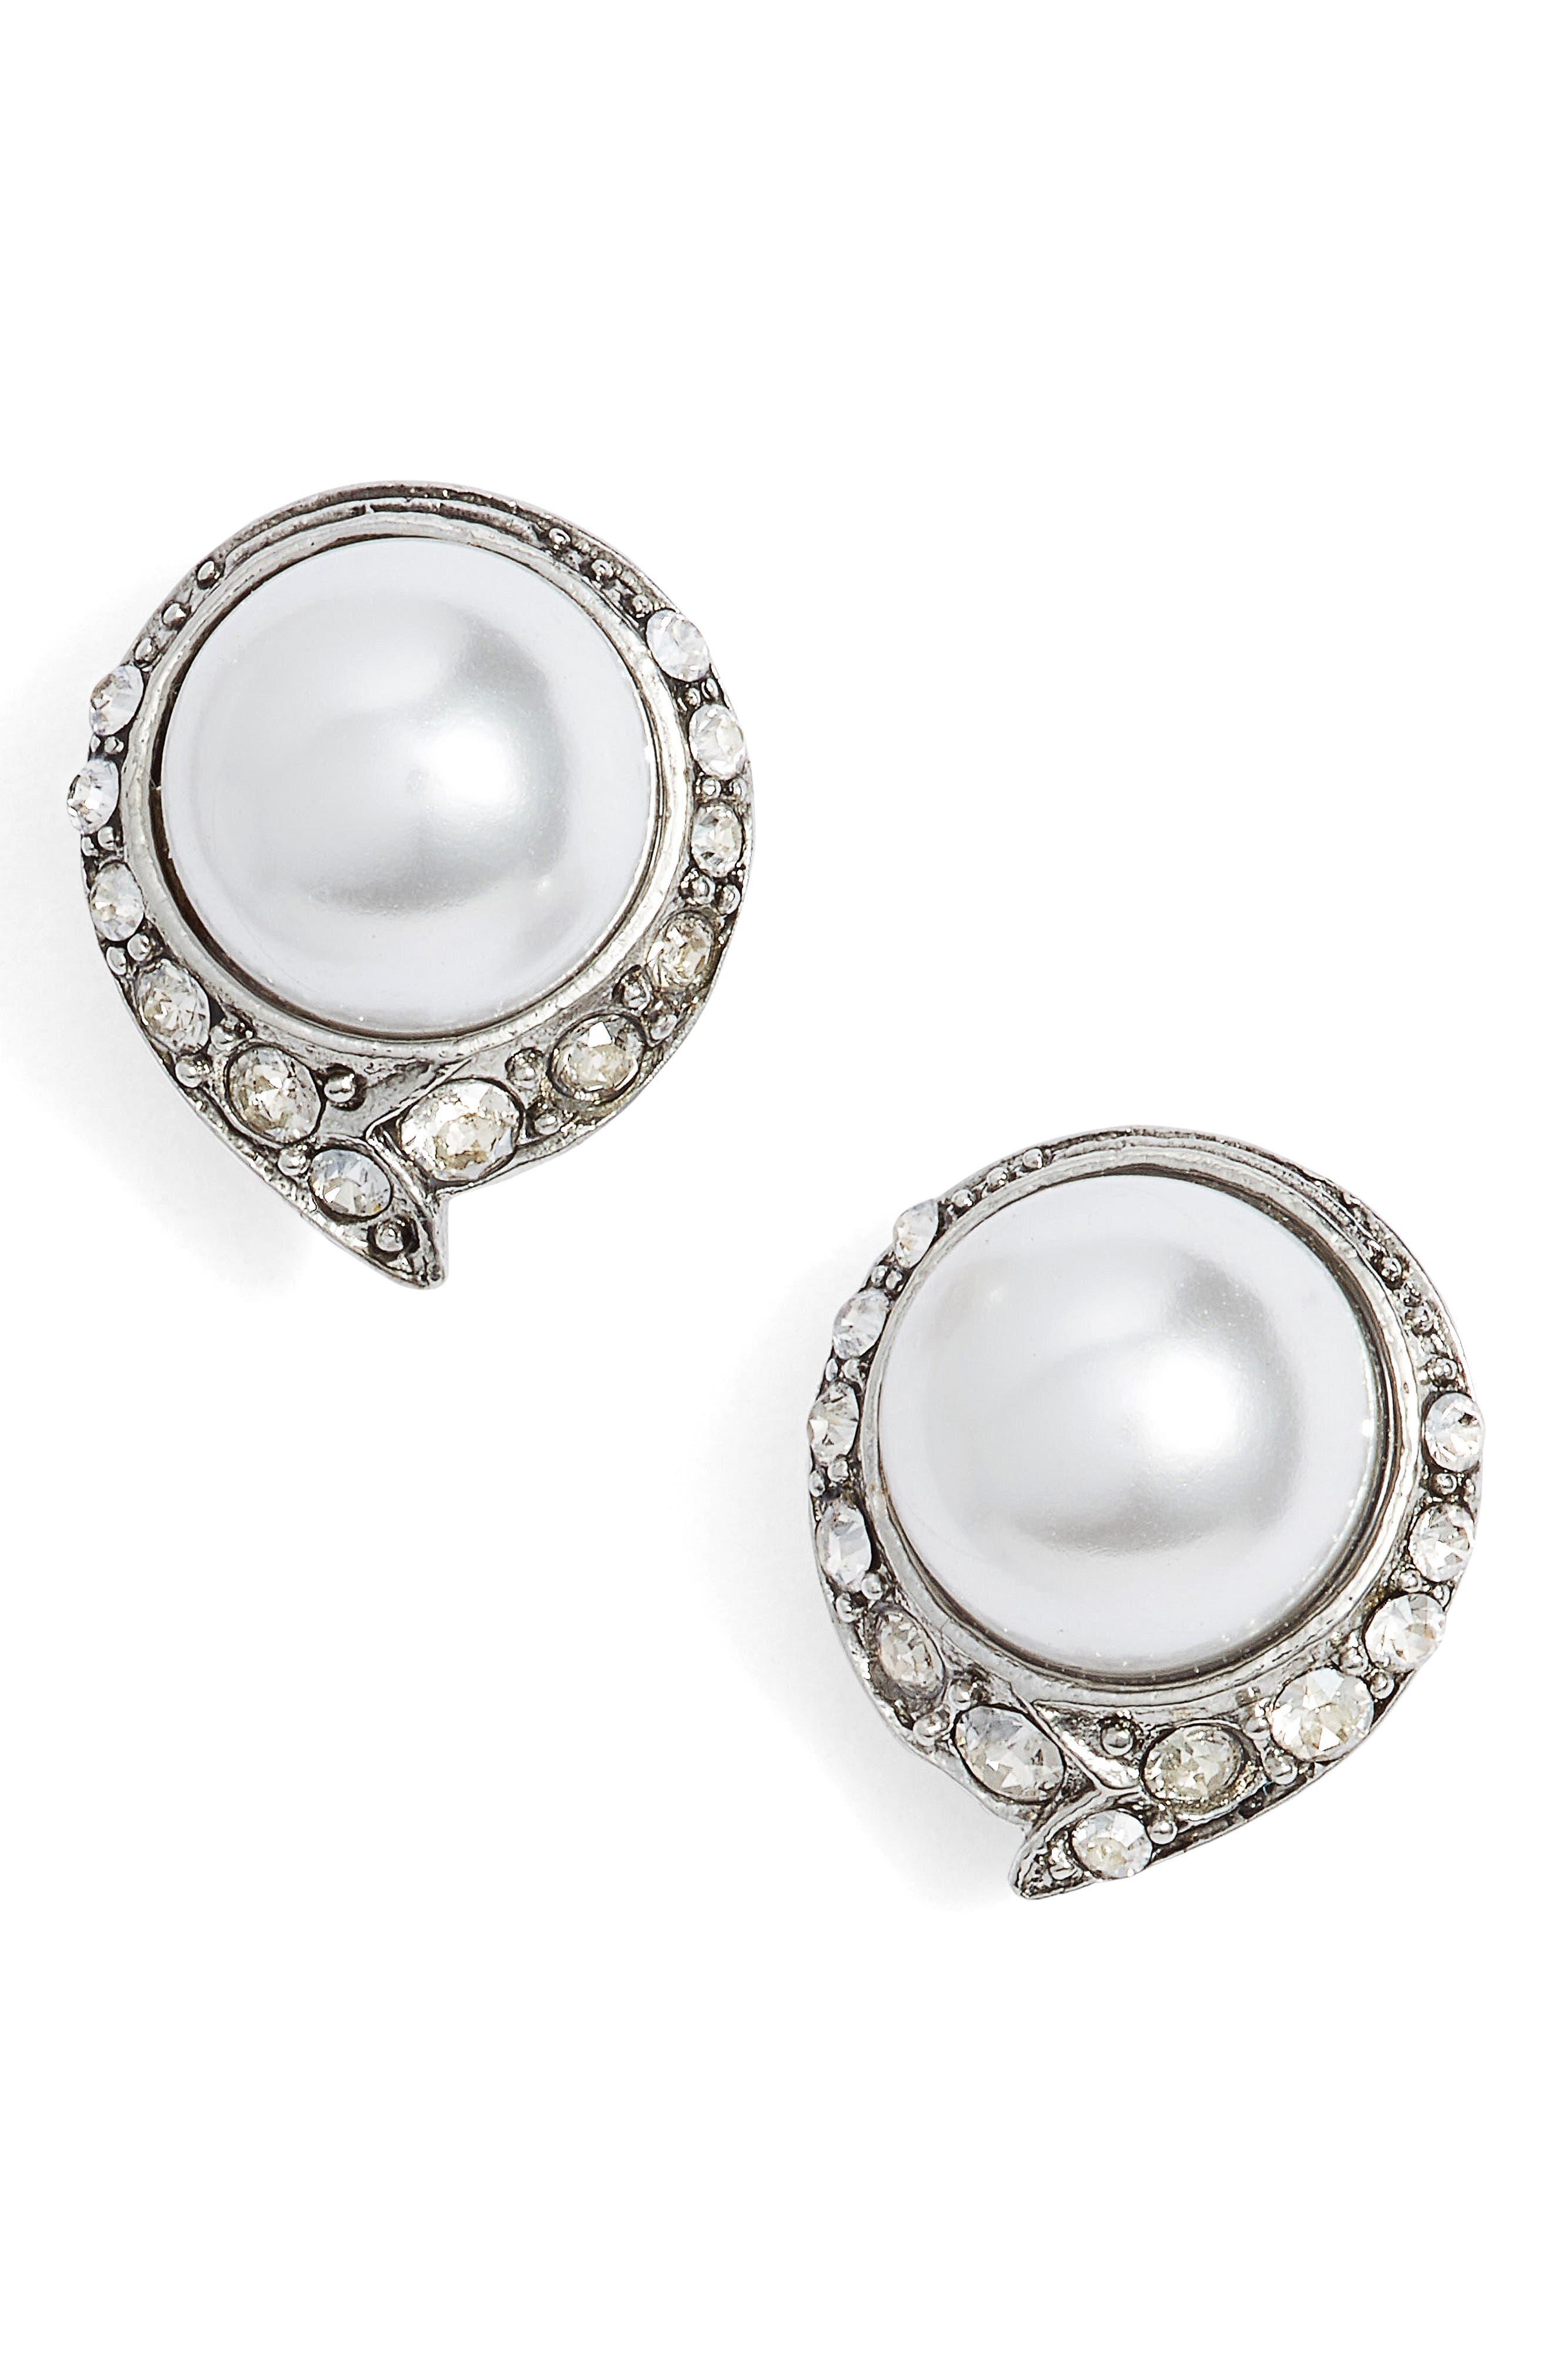 Simulated Pearl Stud Earrings,                             Main thumbnail 1, color,                             040